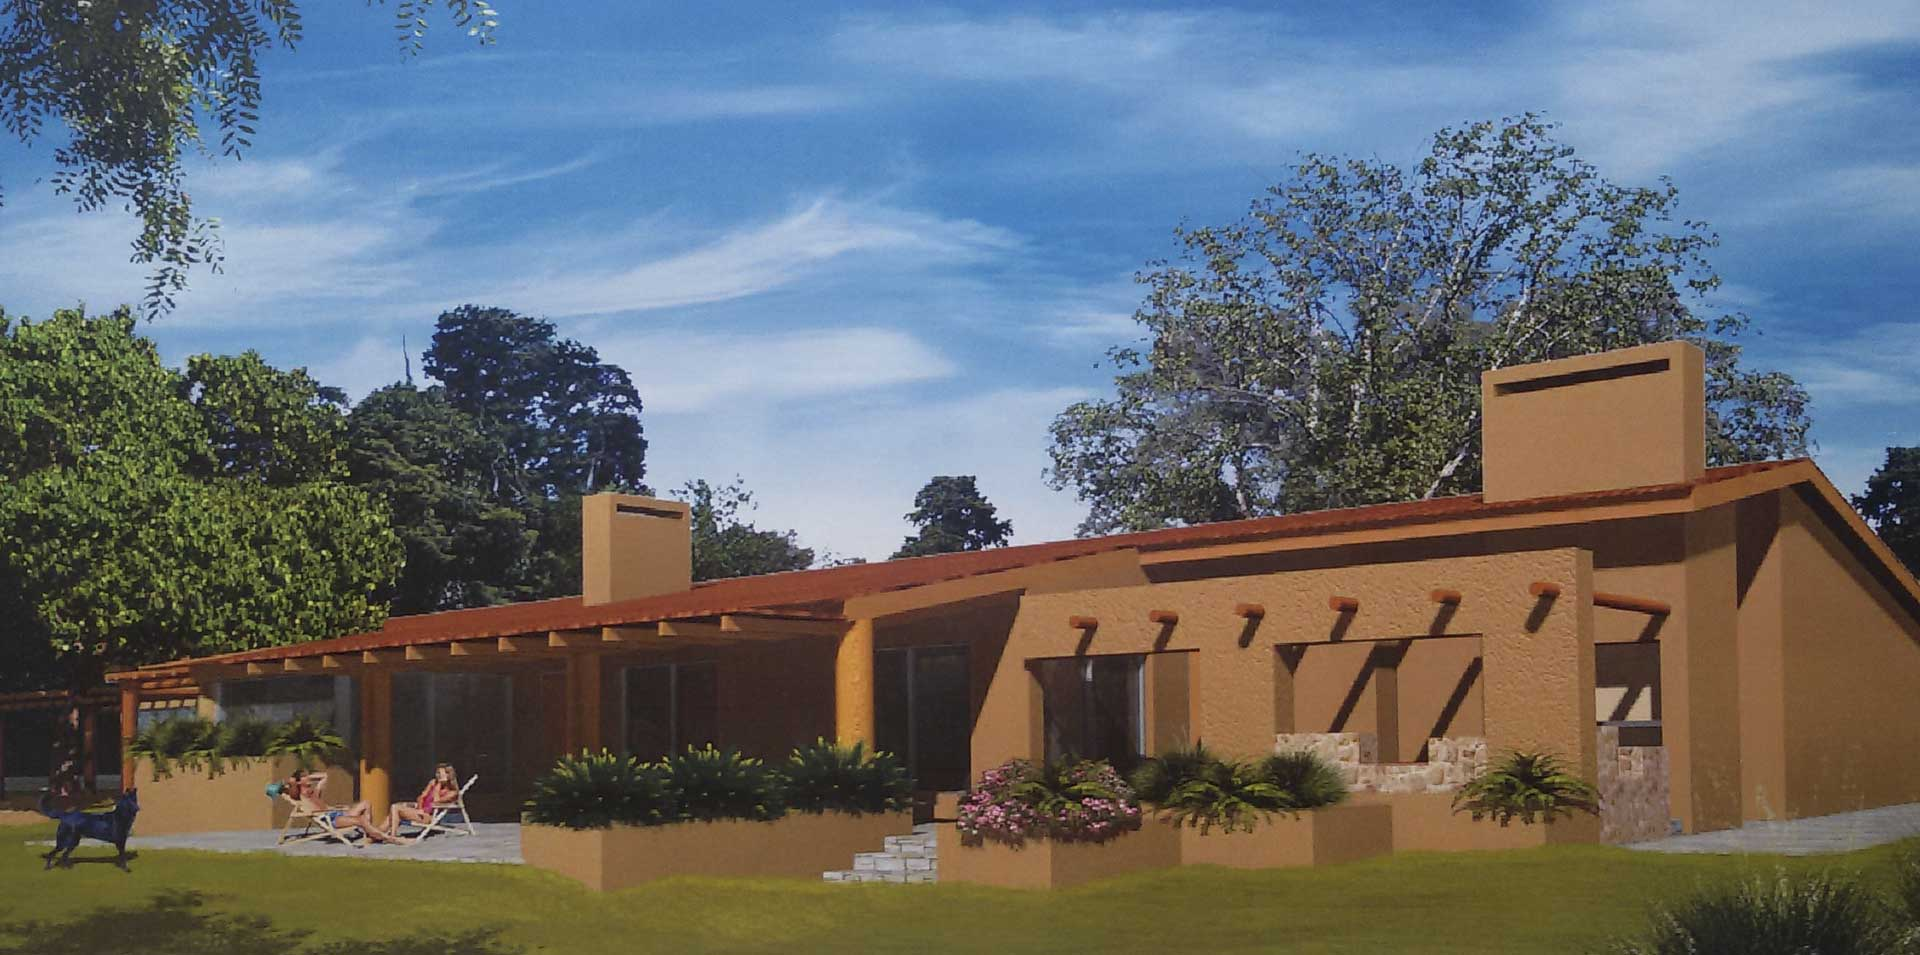 Lfl arquitectos estudio de arquitectura en cordoba - Estudios de arquitectura en tenerife ...